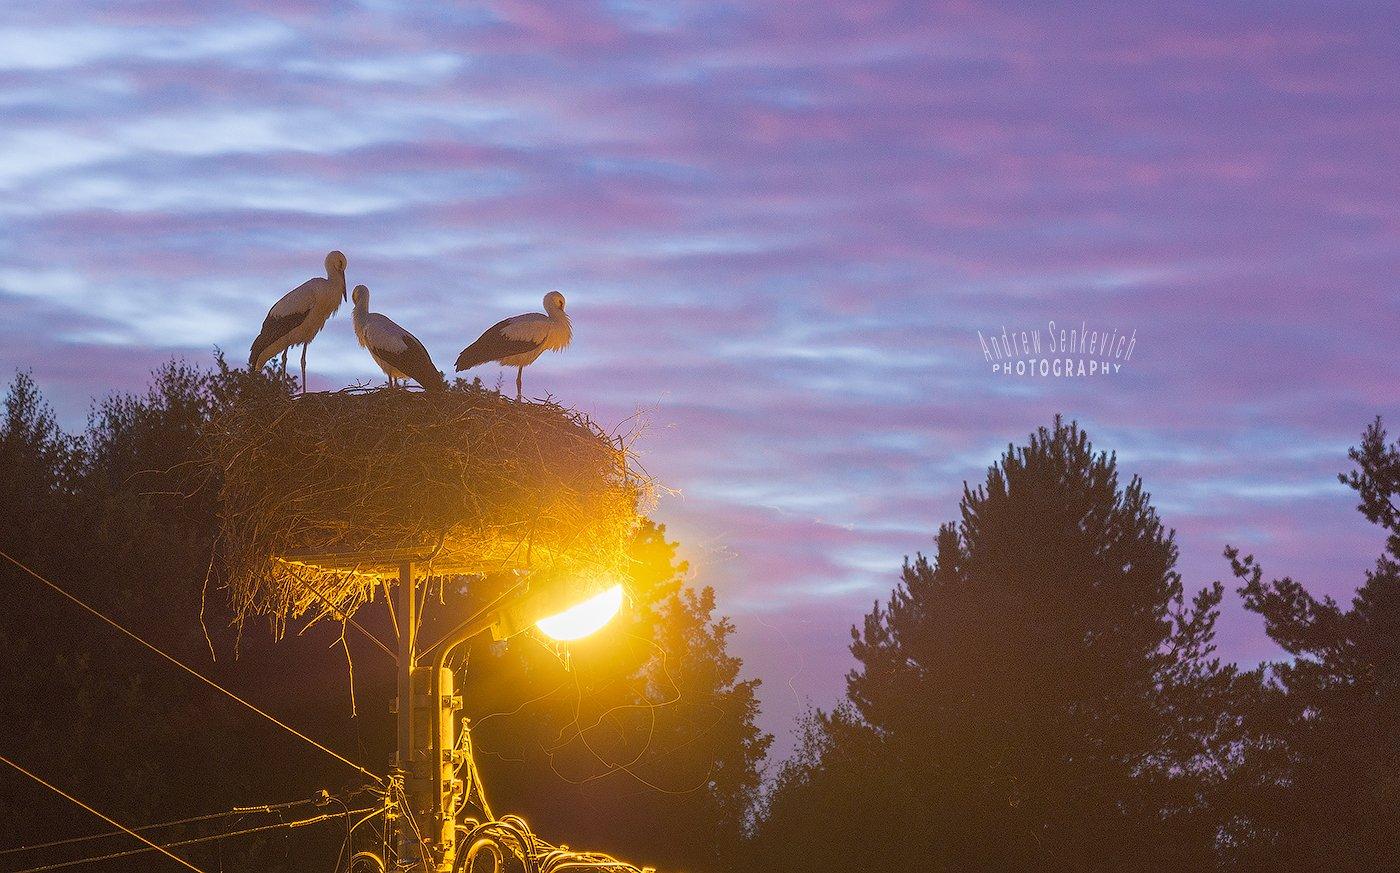 дикий, аист, птенцы, закат, вечер, Андрей Сенкевич